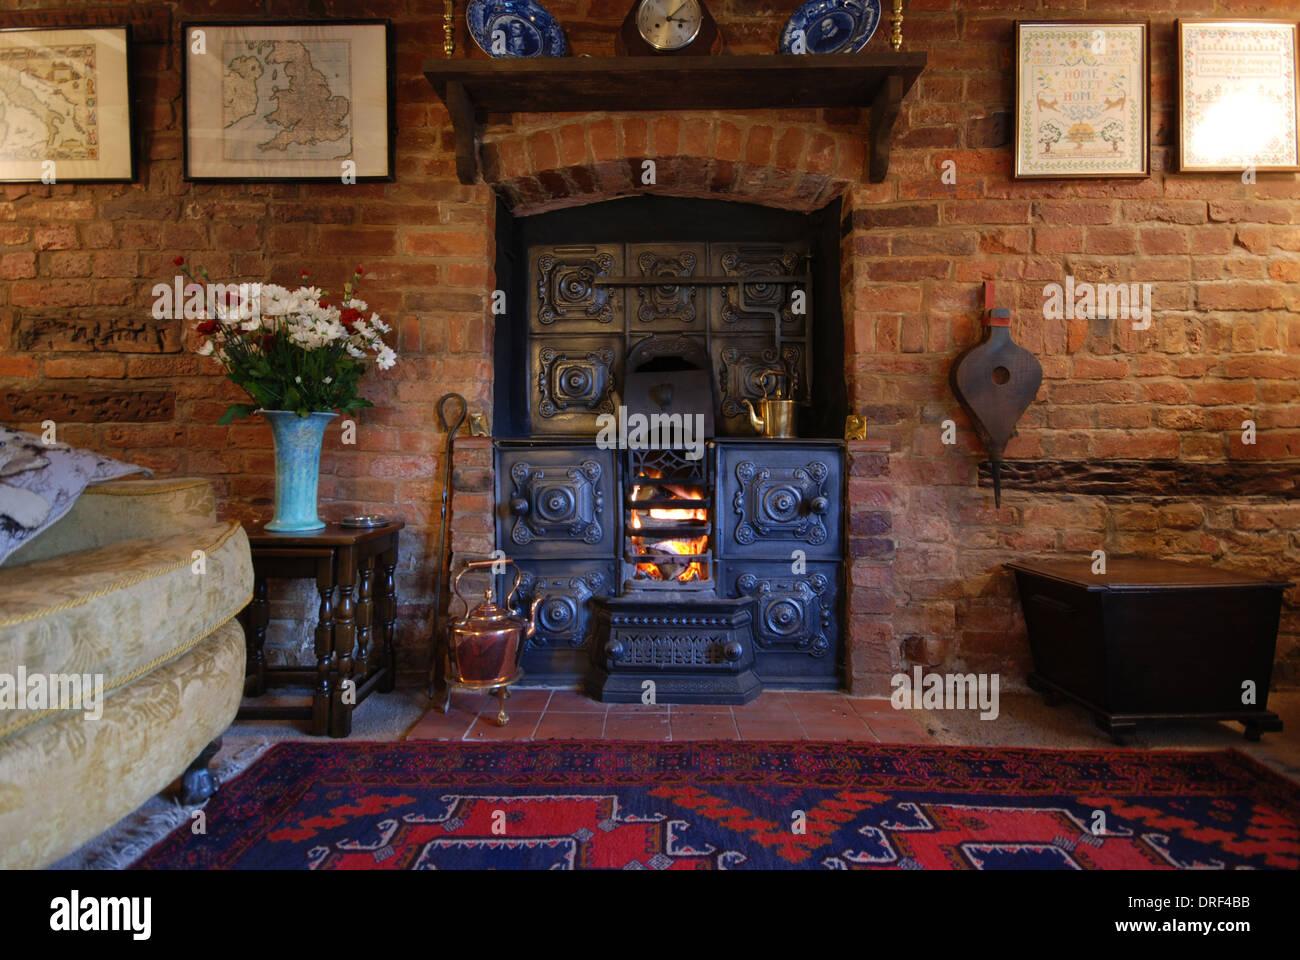 Old cottage cast iron stove fireplace - Stock Image